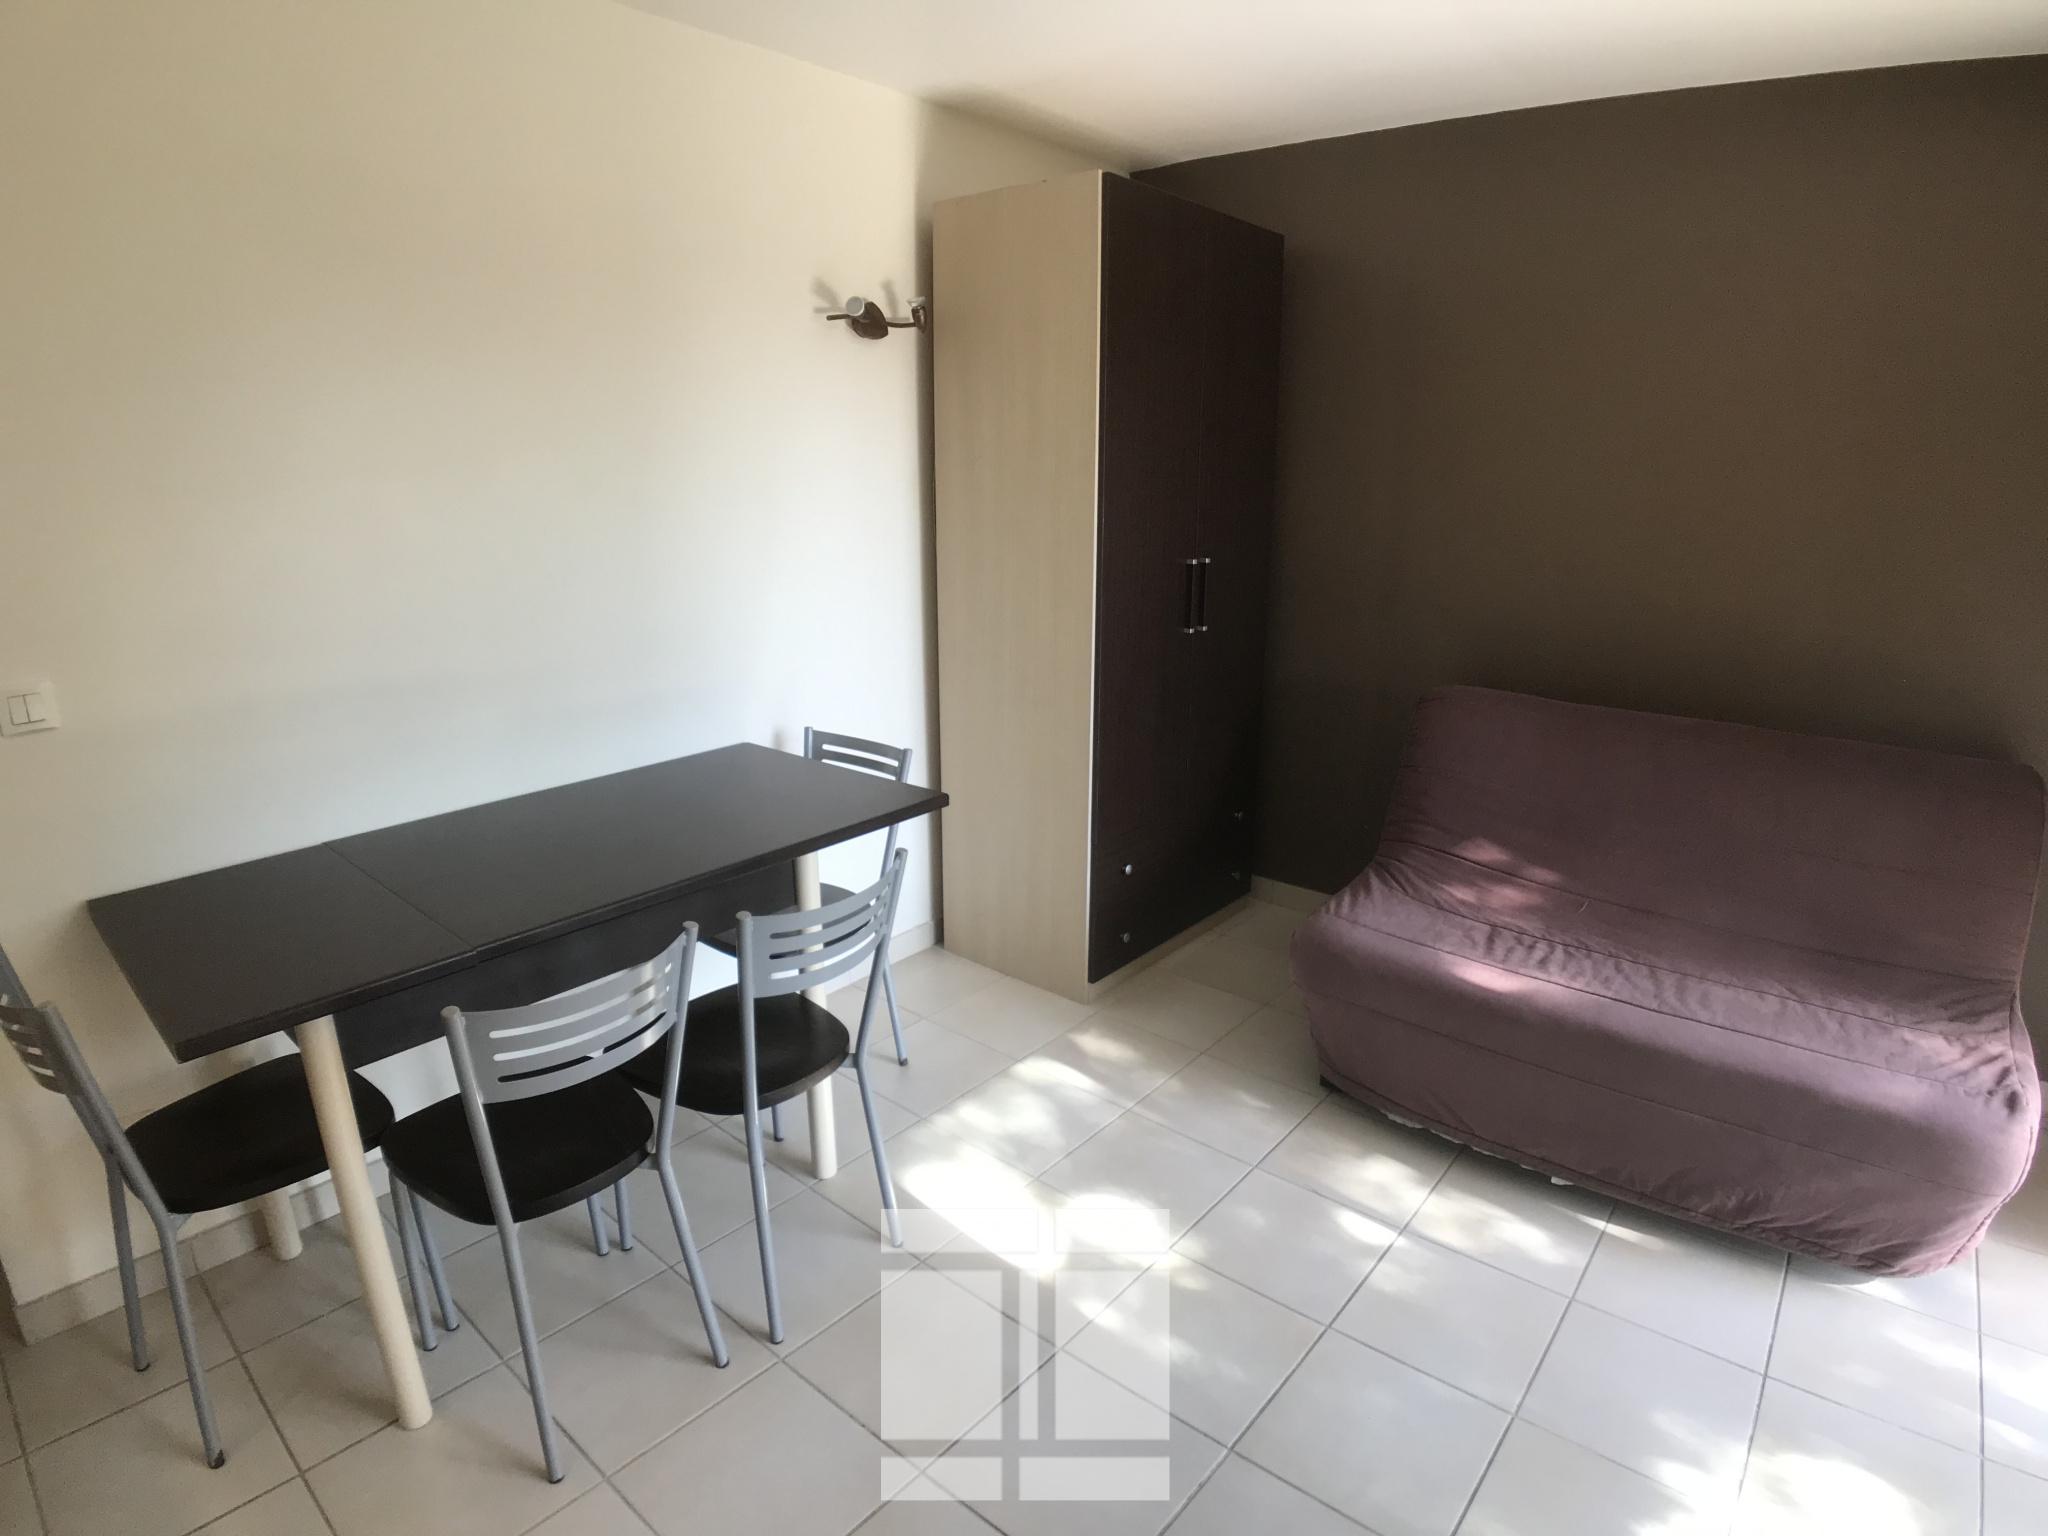 Exclusivité - Appartement T2 proche mer